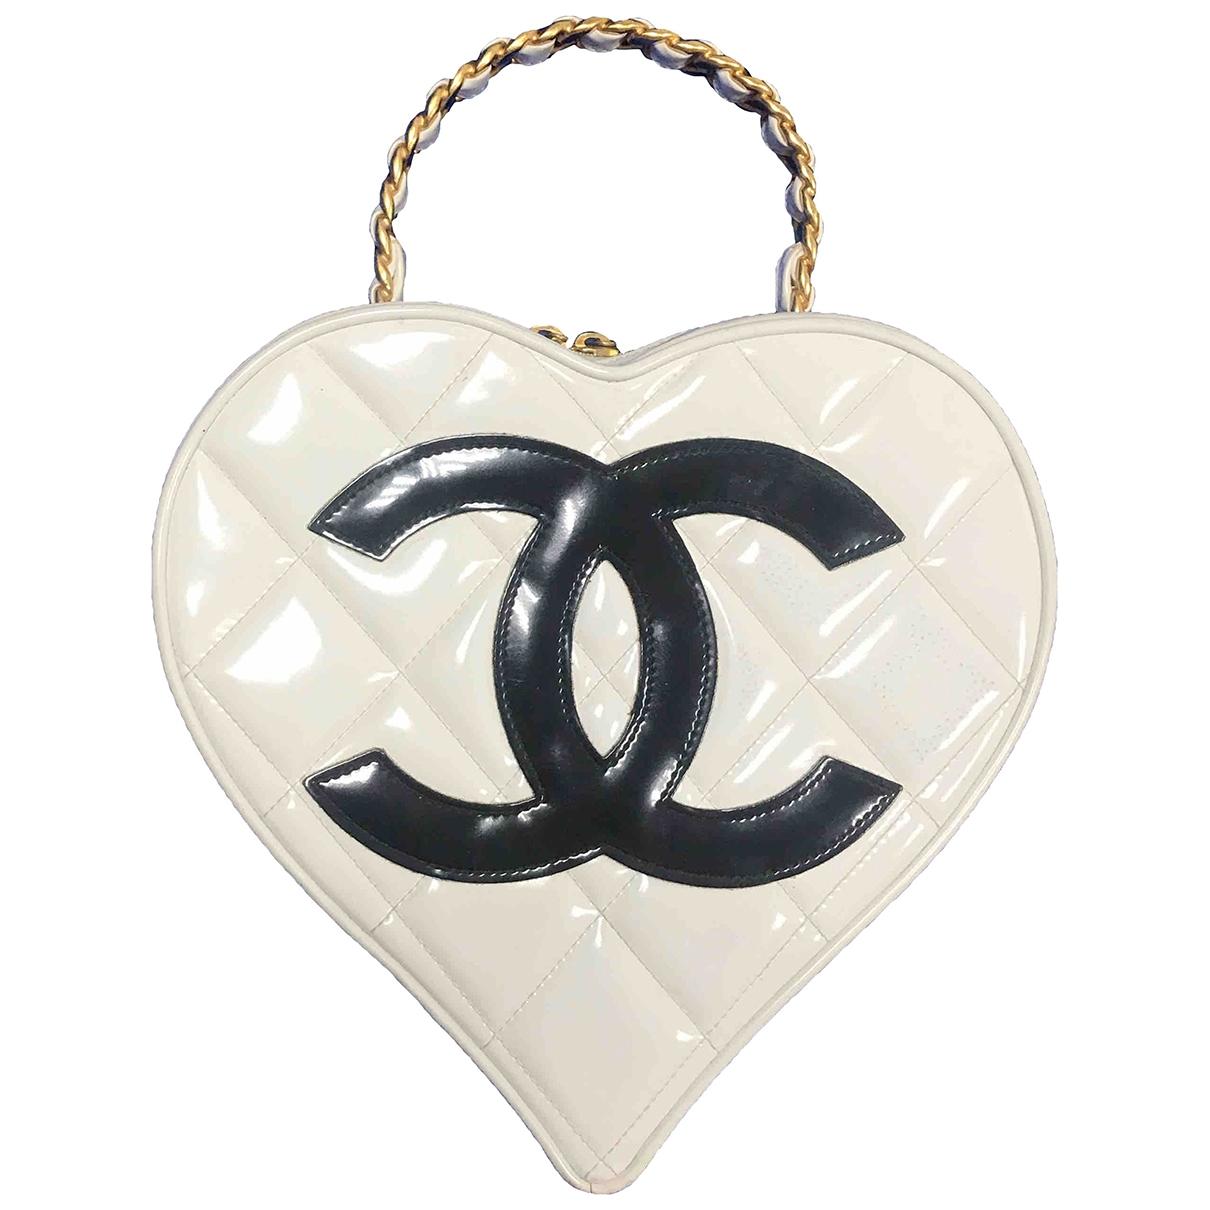 Chanel \N White Patent leather handbag for Women \N